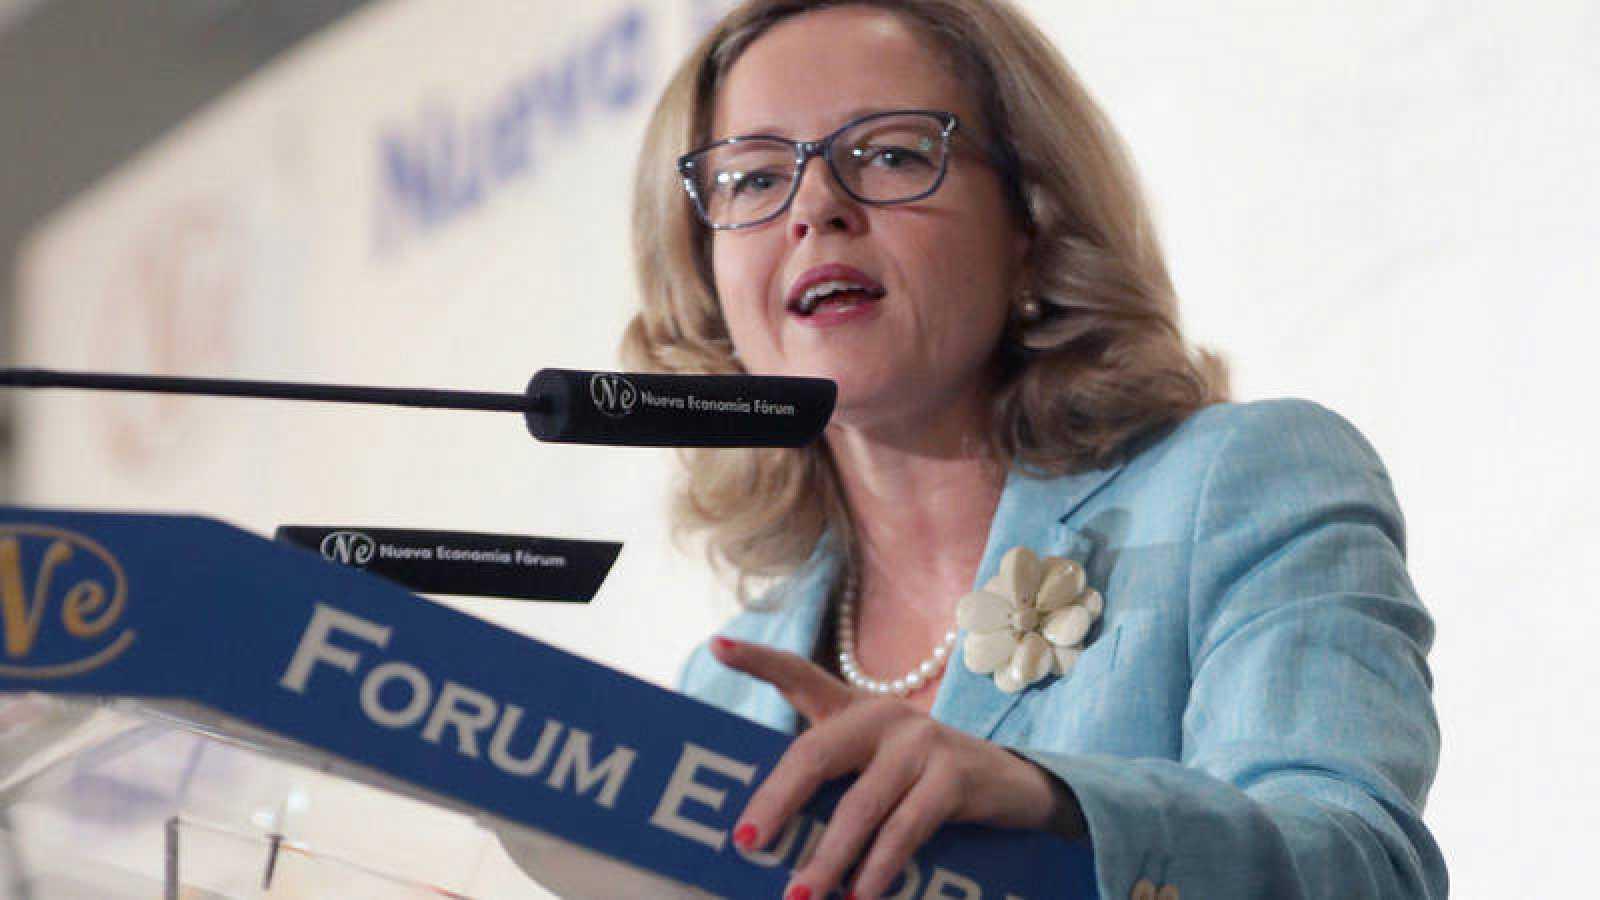 La ministra de Economía, Nadia Calviño